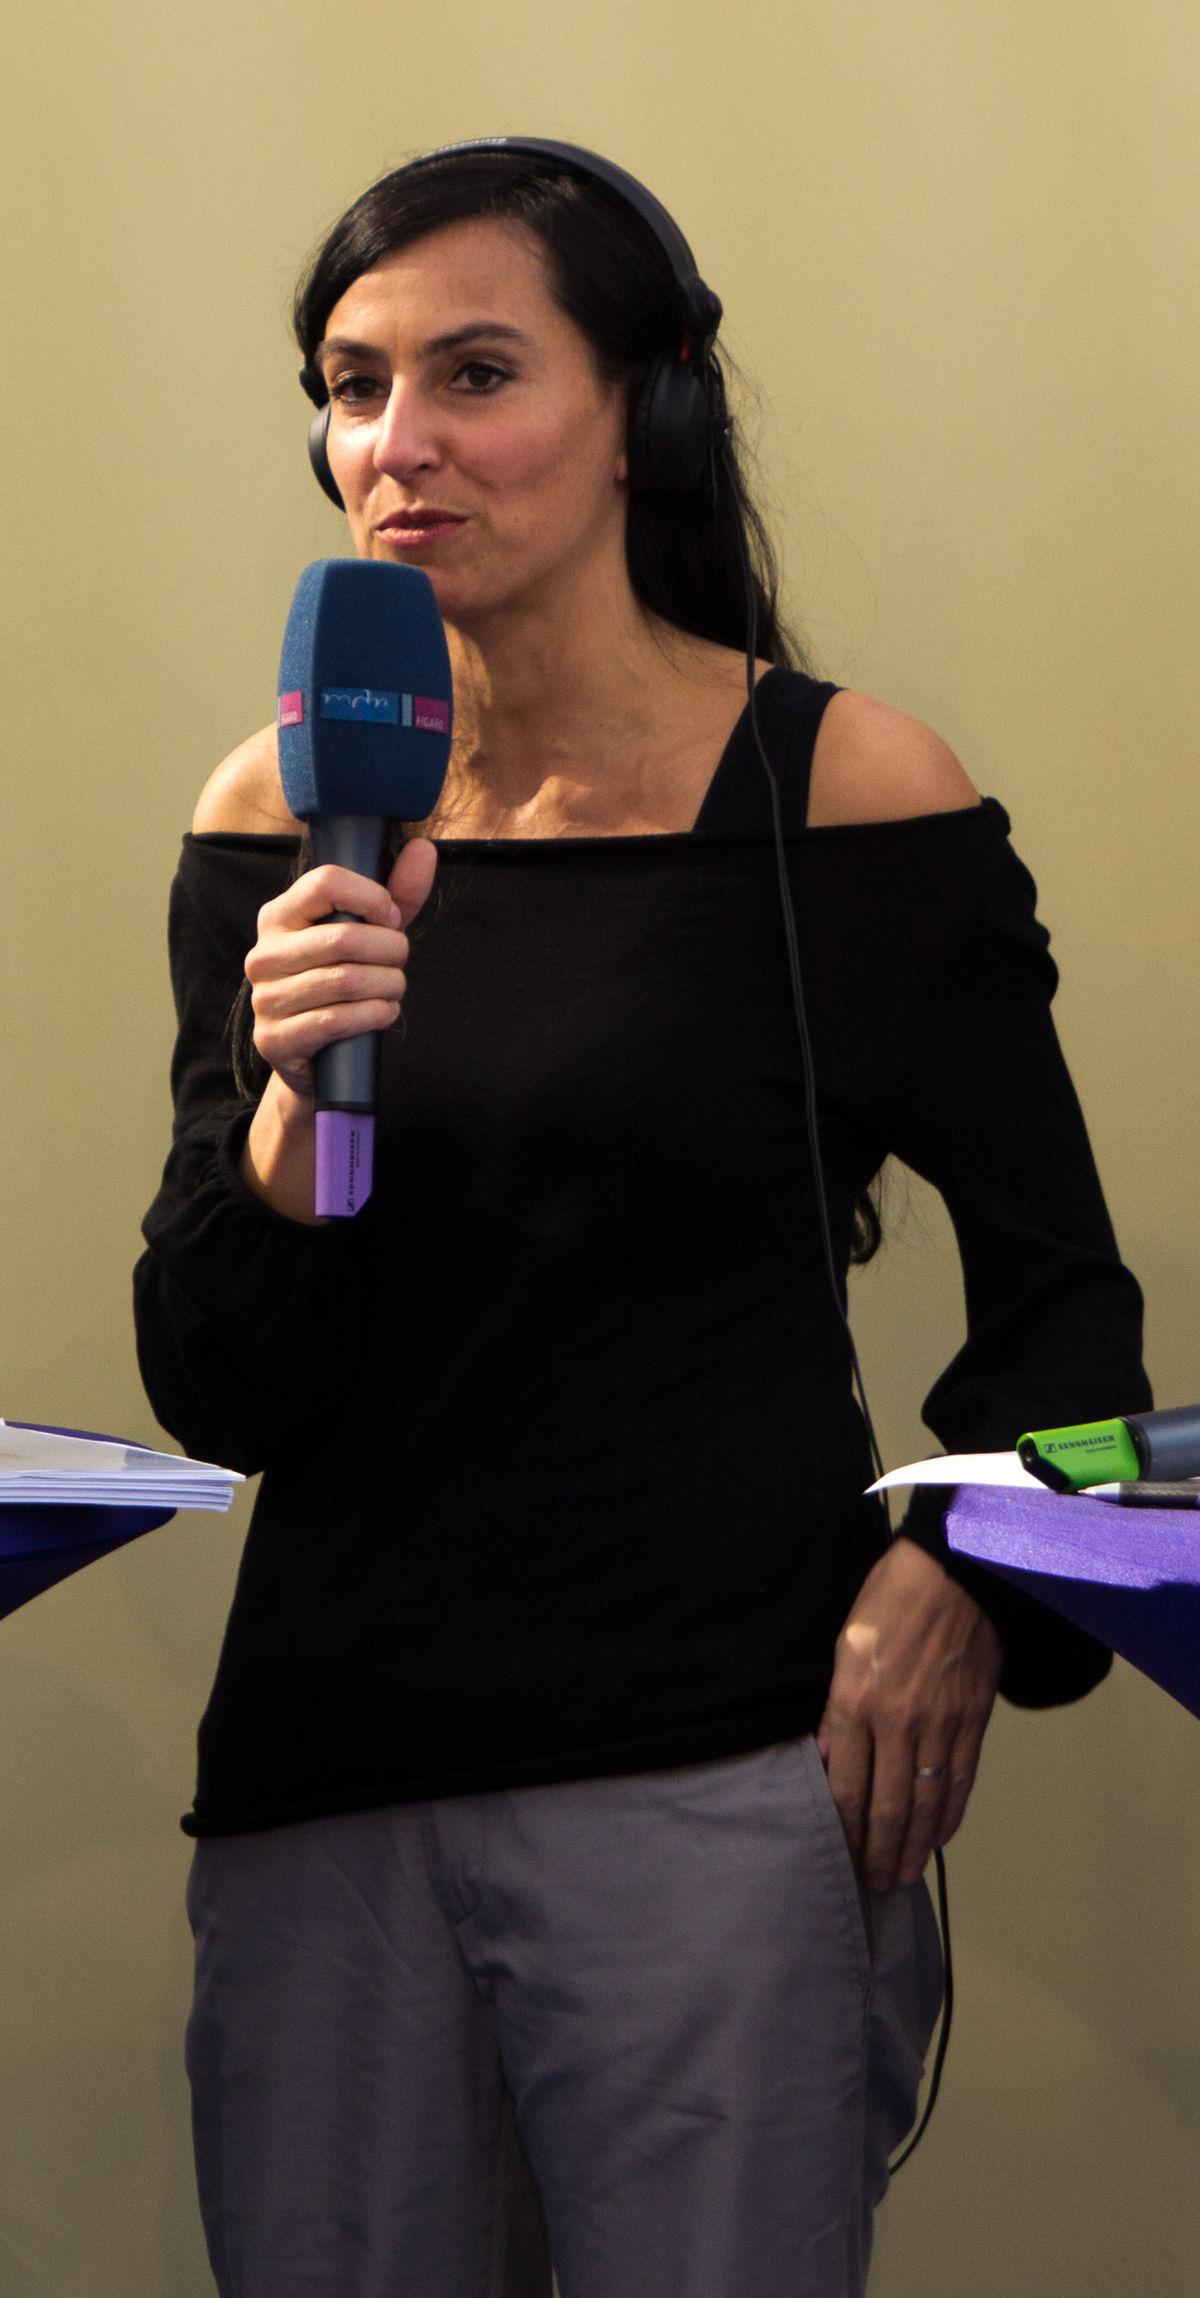 Saalfrank Katharina